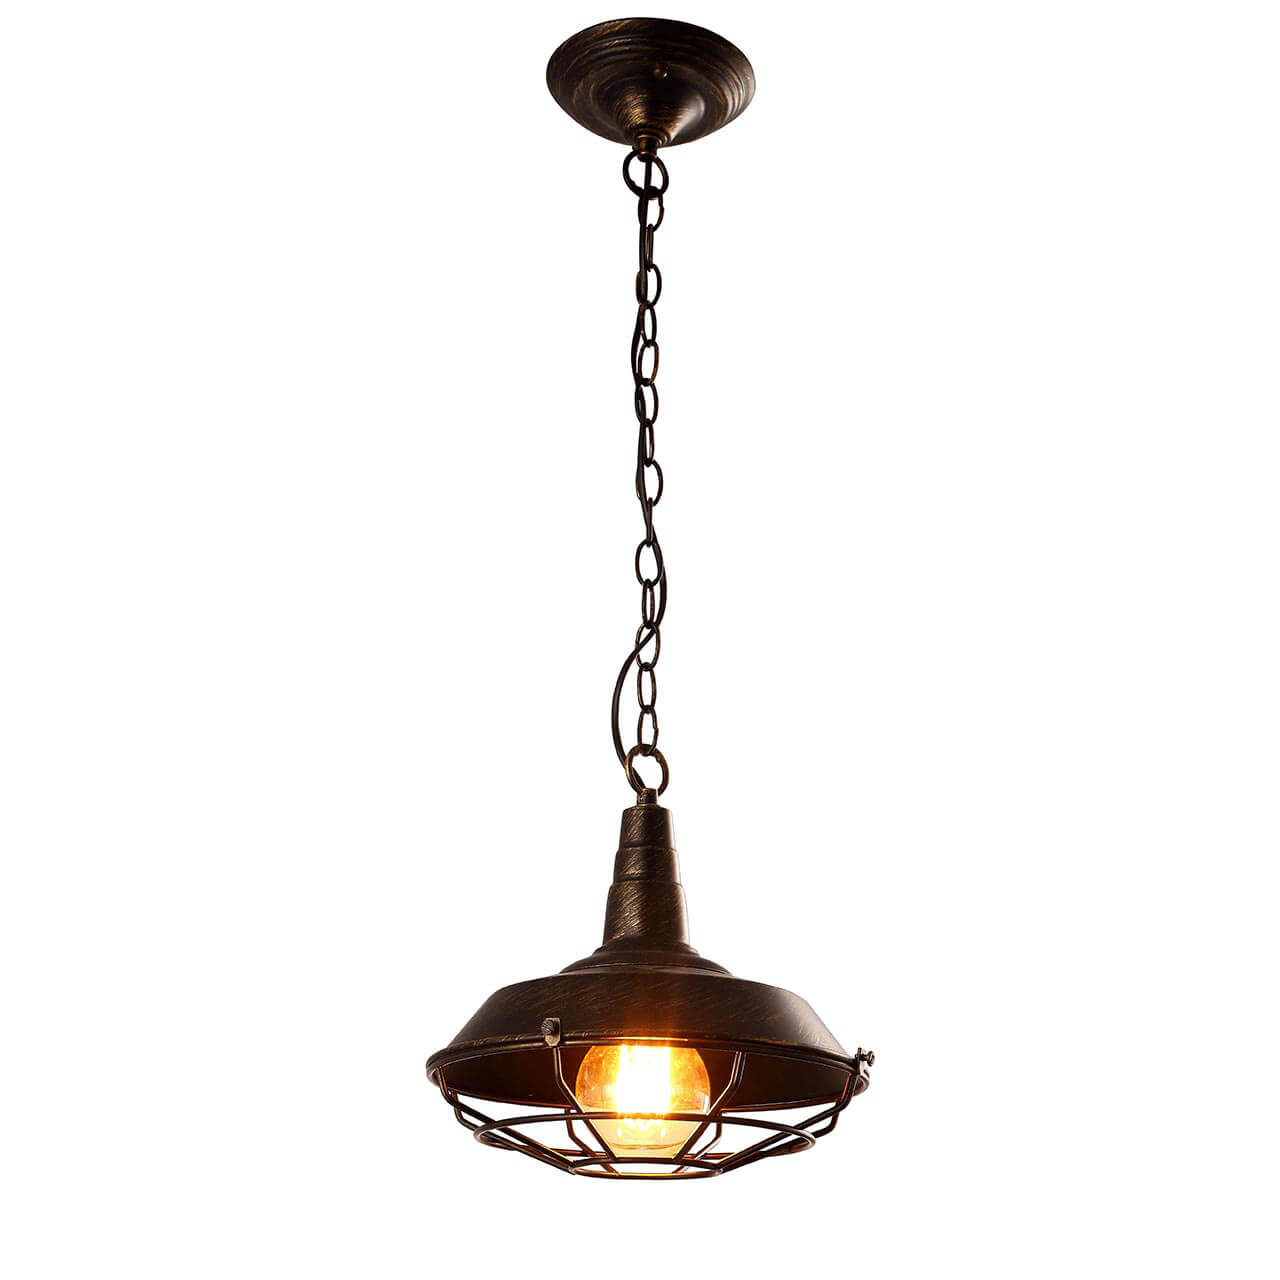 Подвесной светильник Arte Lamp Ferrico A9181SP-1BR бра arte lamp ferrico a9183ap 1br